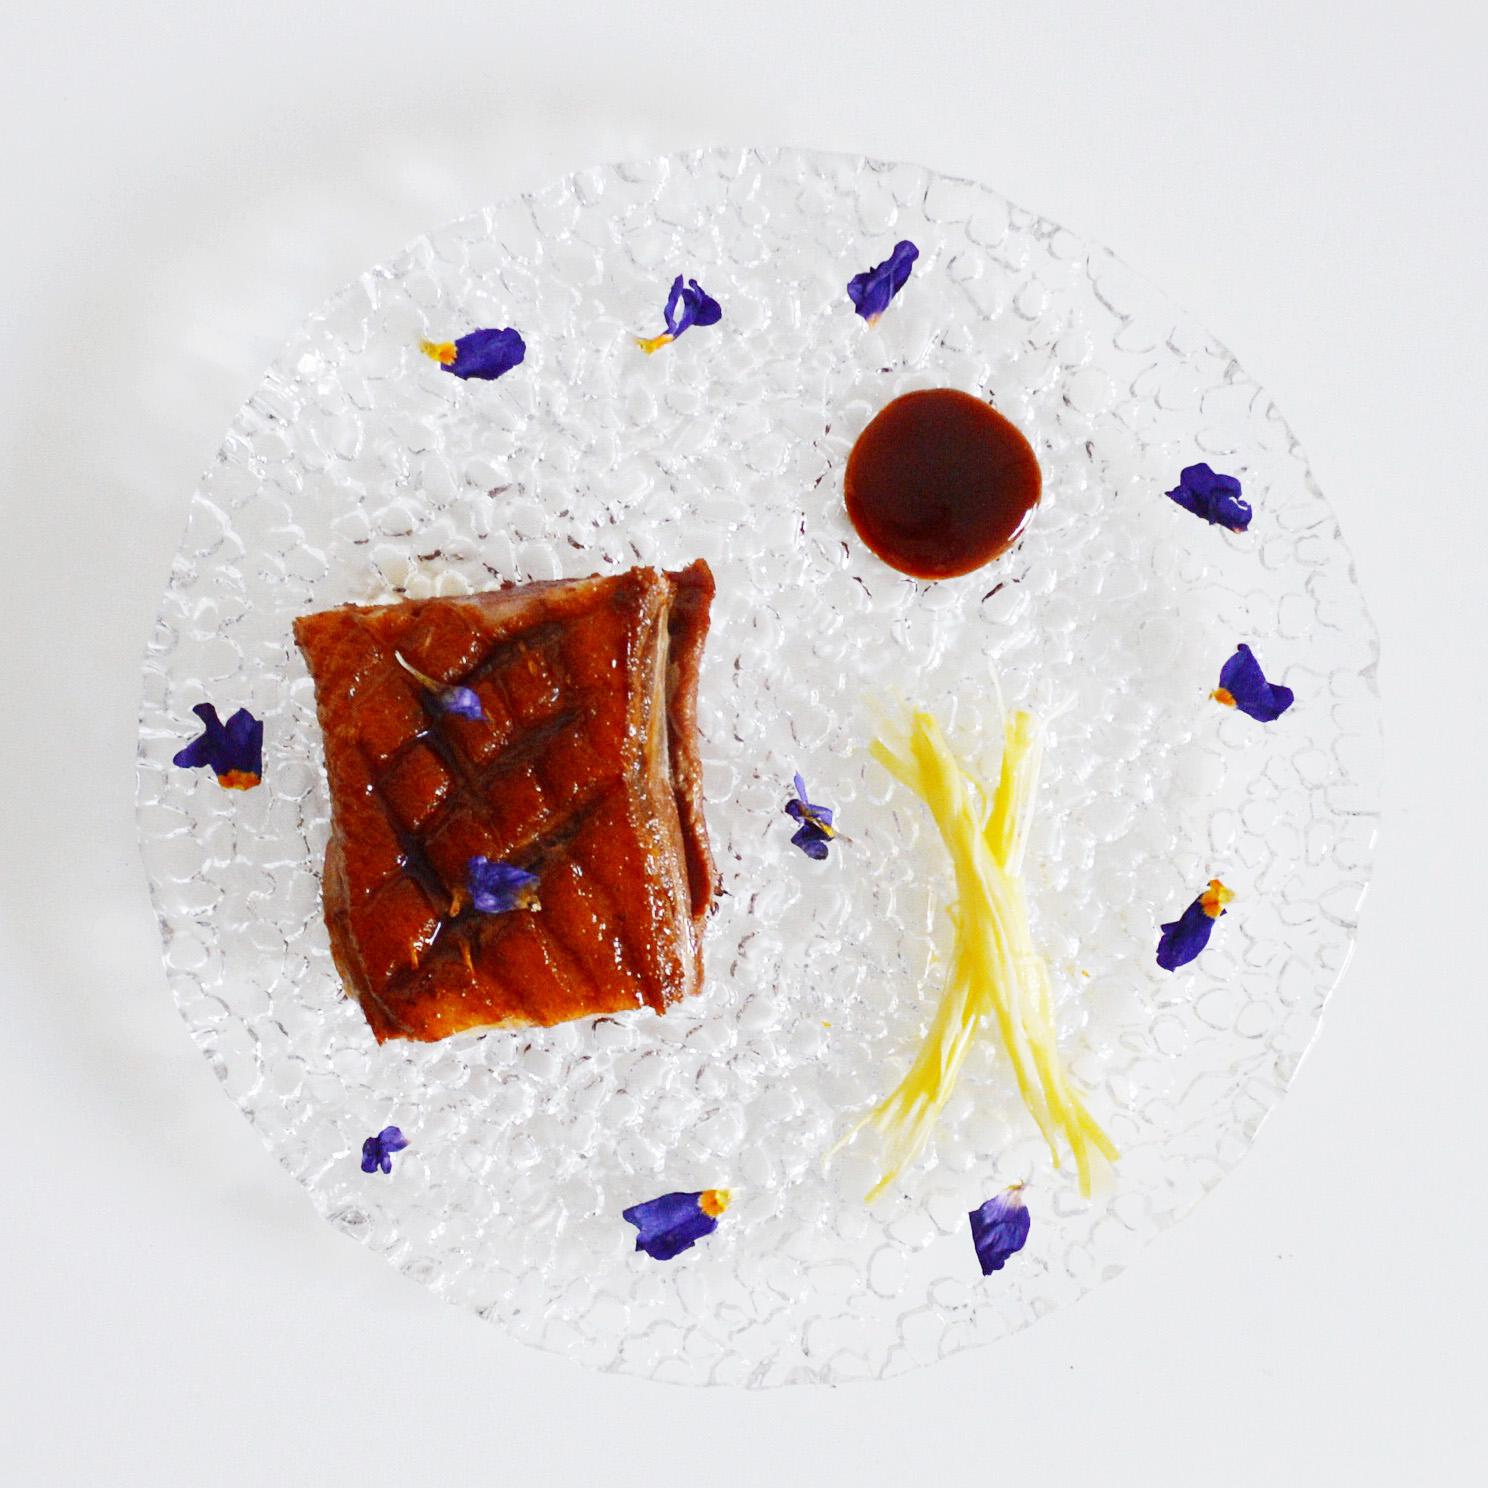 Magret de Canard with Braided Leeks, Plum Sauce and Flower Petals